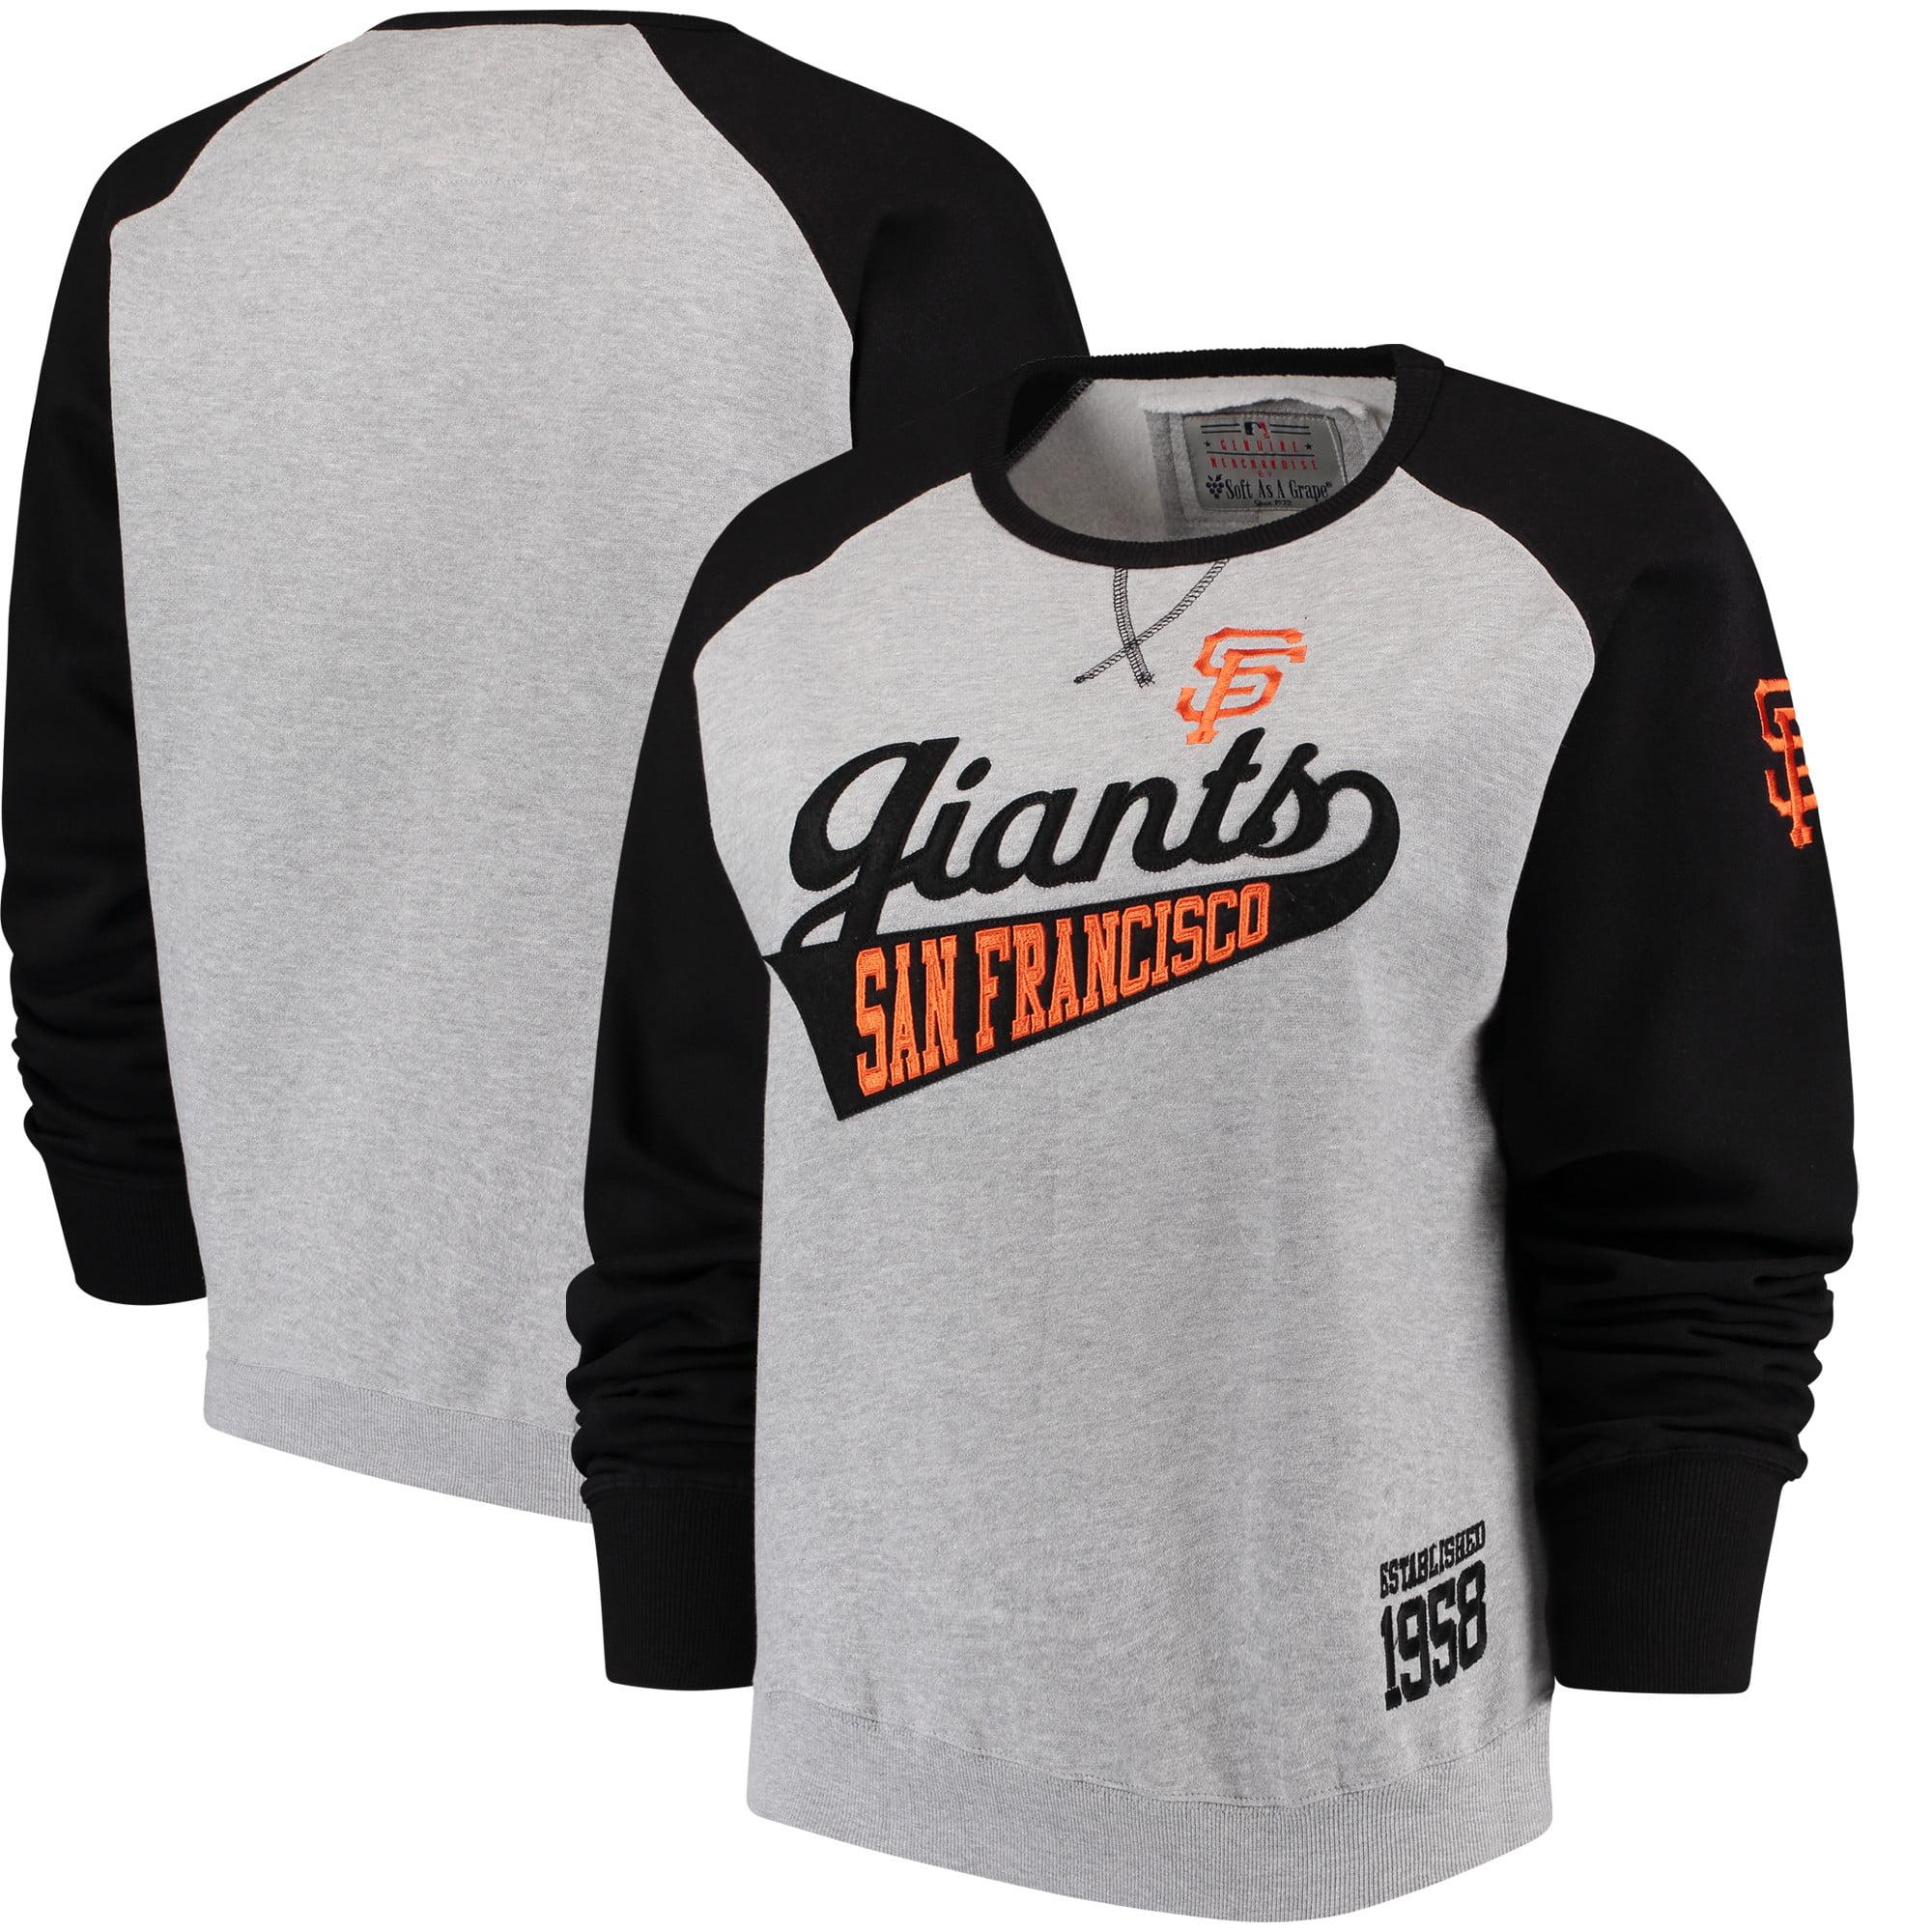 San Francisco Giants Soft as a Grape Women's Plus Size Payoff Pitch Color Blocked Sweatshirt - Gray/Black